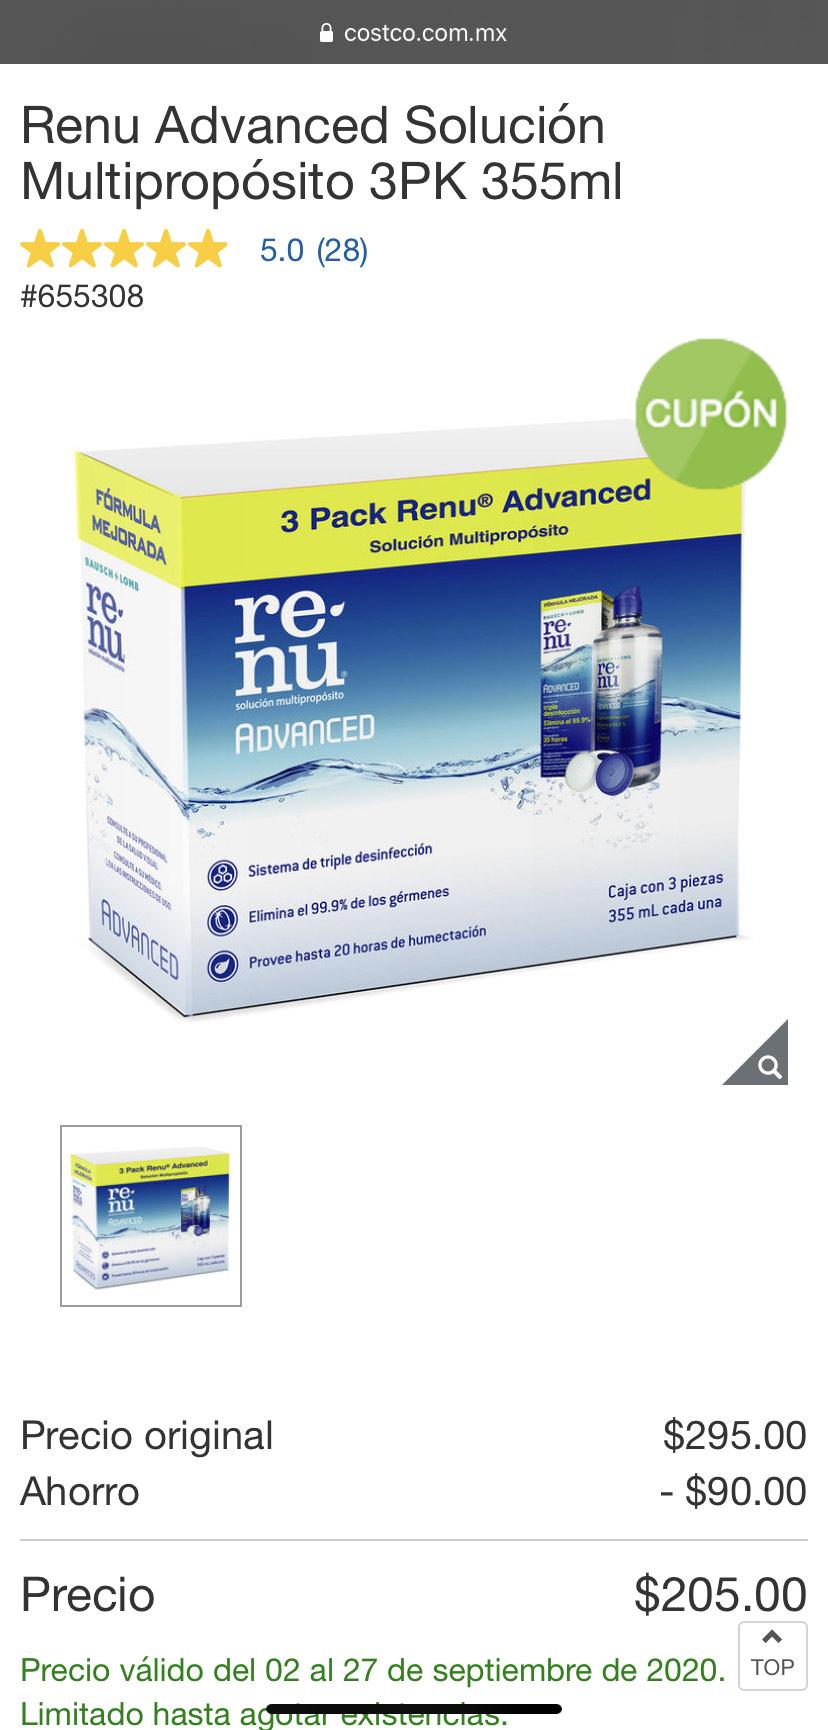 Costco Renu Multipropósito 3PK 355ml para lentes de contacto